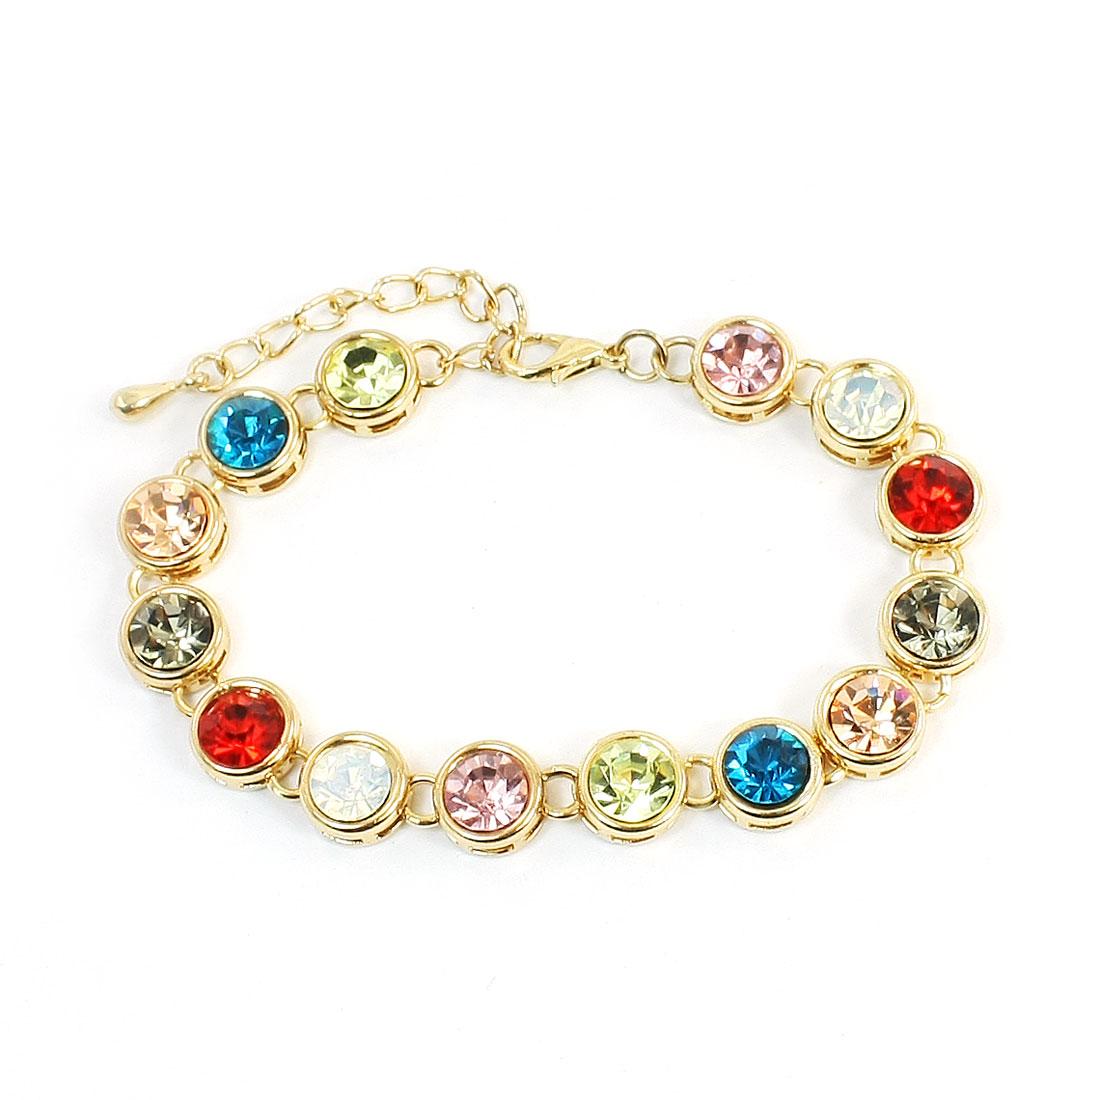 Women Lobster Hook Multicolor Rhinestone Inlaid Gold Tone Wrist Bracelet